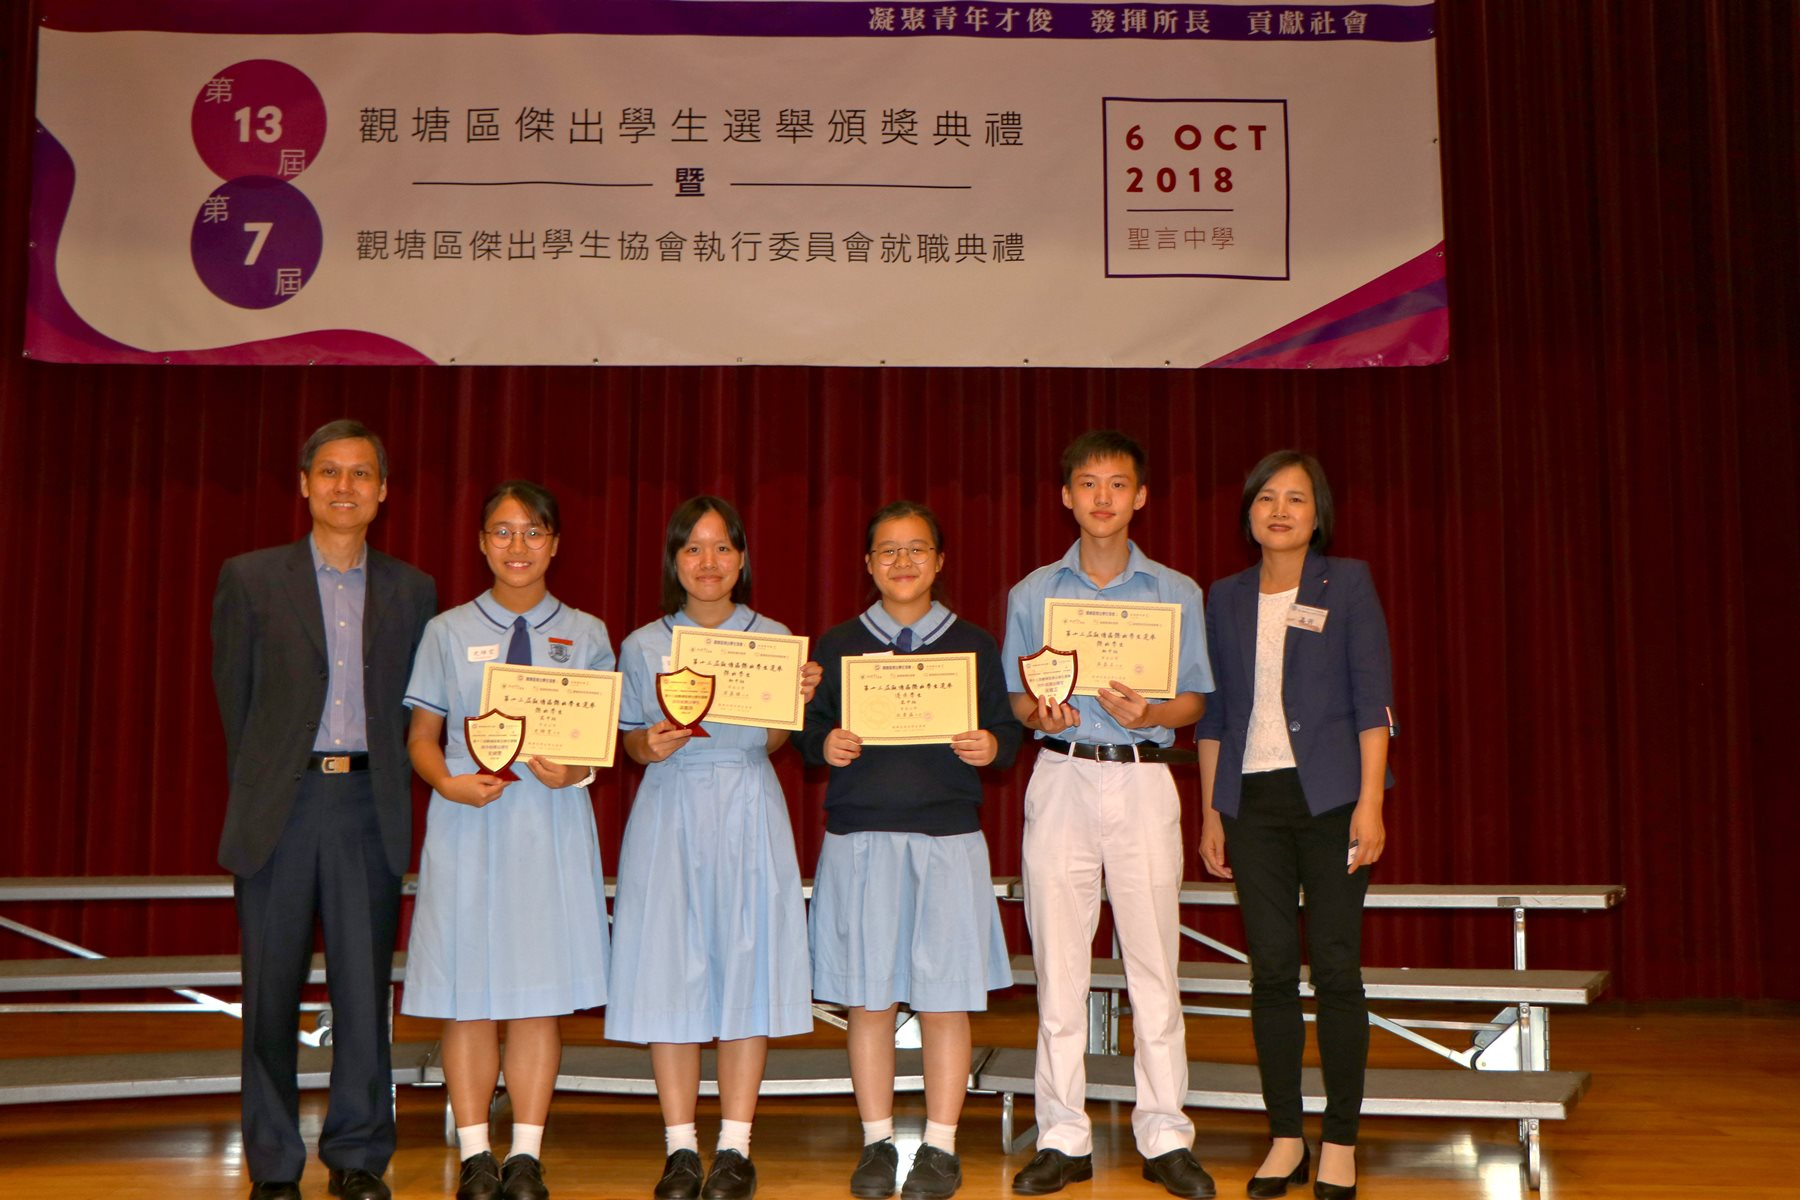 http://npc.edu.hk/sites/default/files/img_5793.jpg